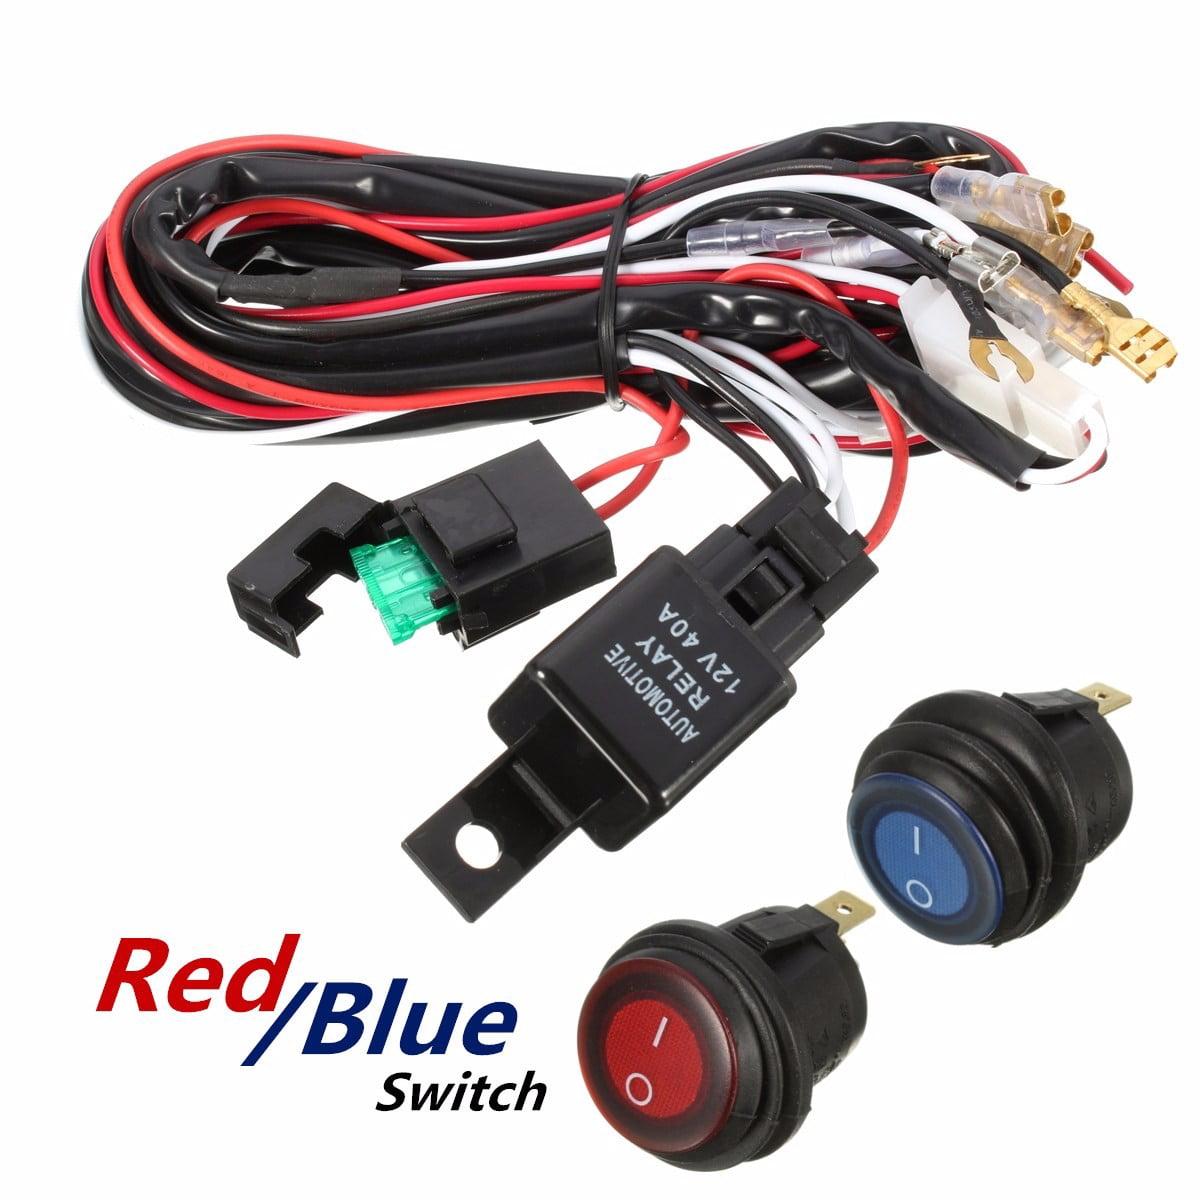 Wiring Harness Relay 40A 12V LED Light Bar Blue Switch FIT Off Road ATV  US,Red color - Walmart.com - Walmart.comWalmart